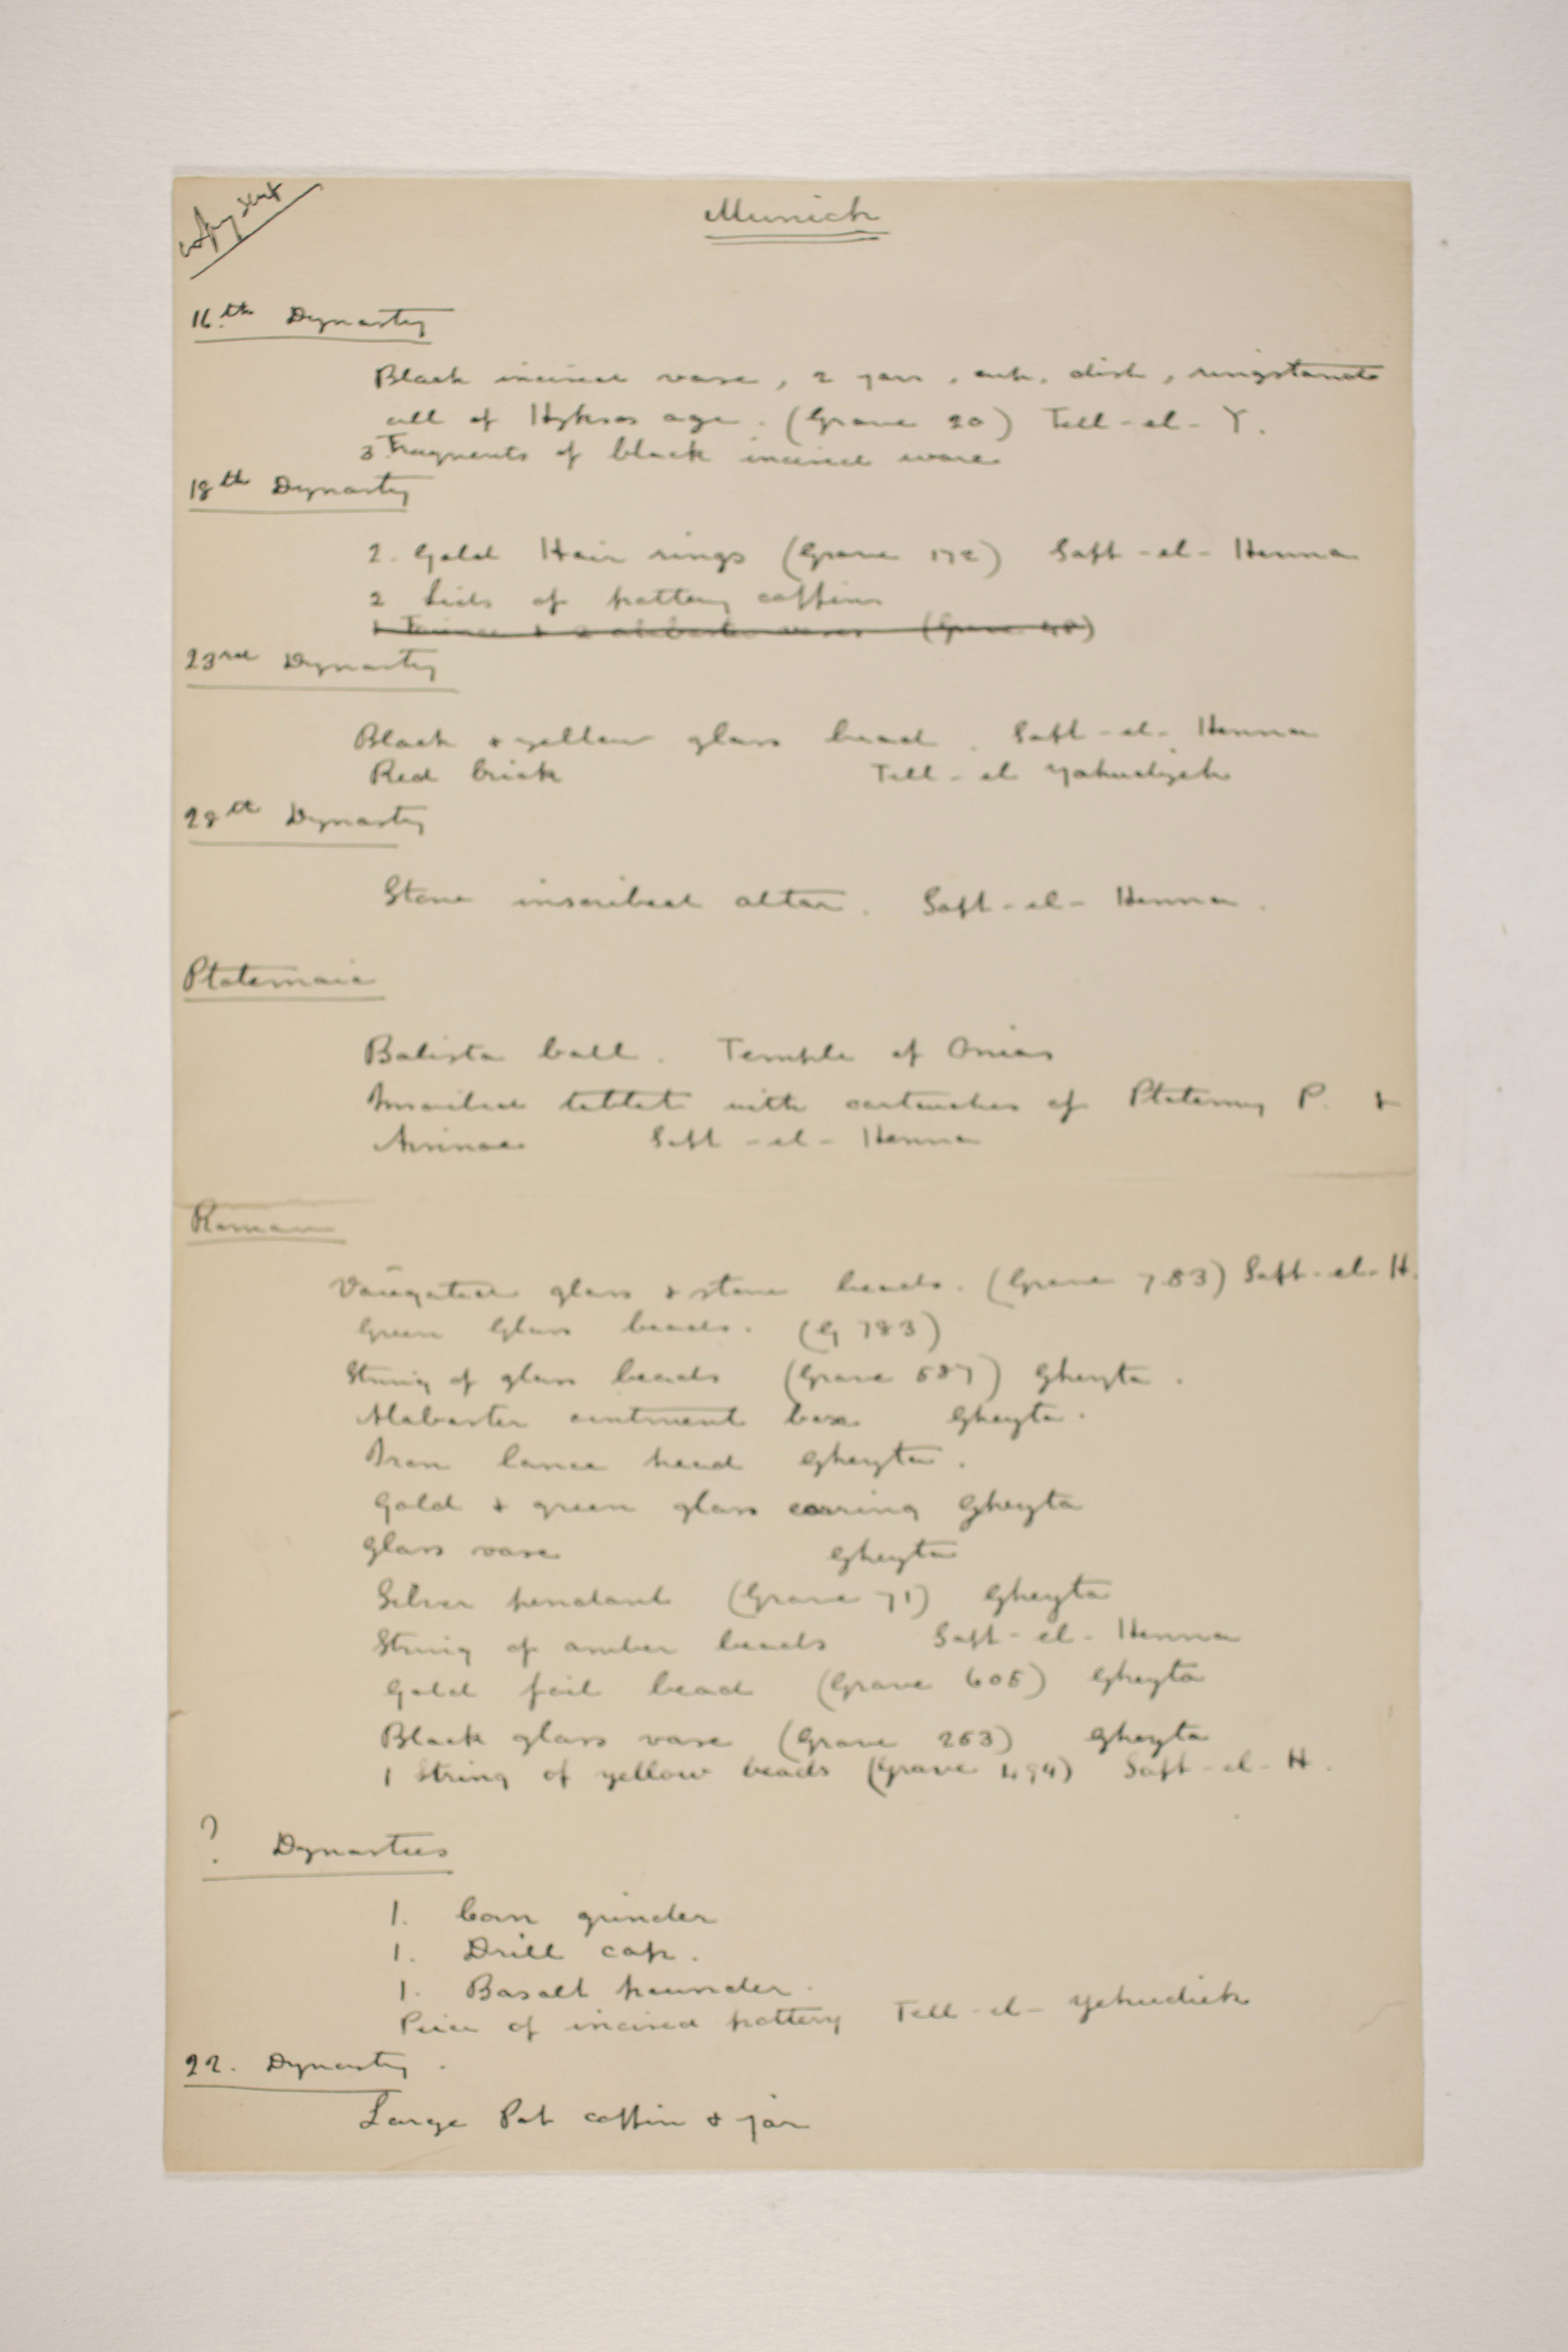 1905-06 Eastern Delta: Belbeis, Tell el-Rataba, Saft el-Hinna, Tell el-Yahudiya, Shaghanbeh, Ghita Individual institution list  PMA/WFP1/D/14/20